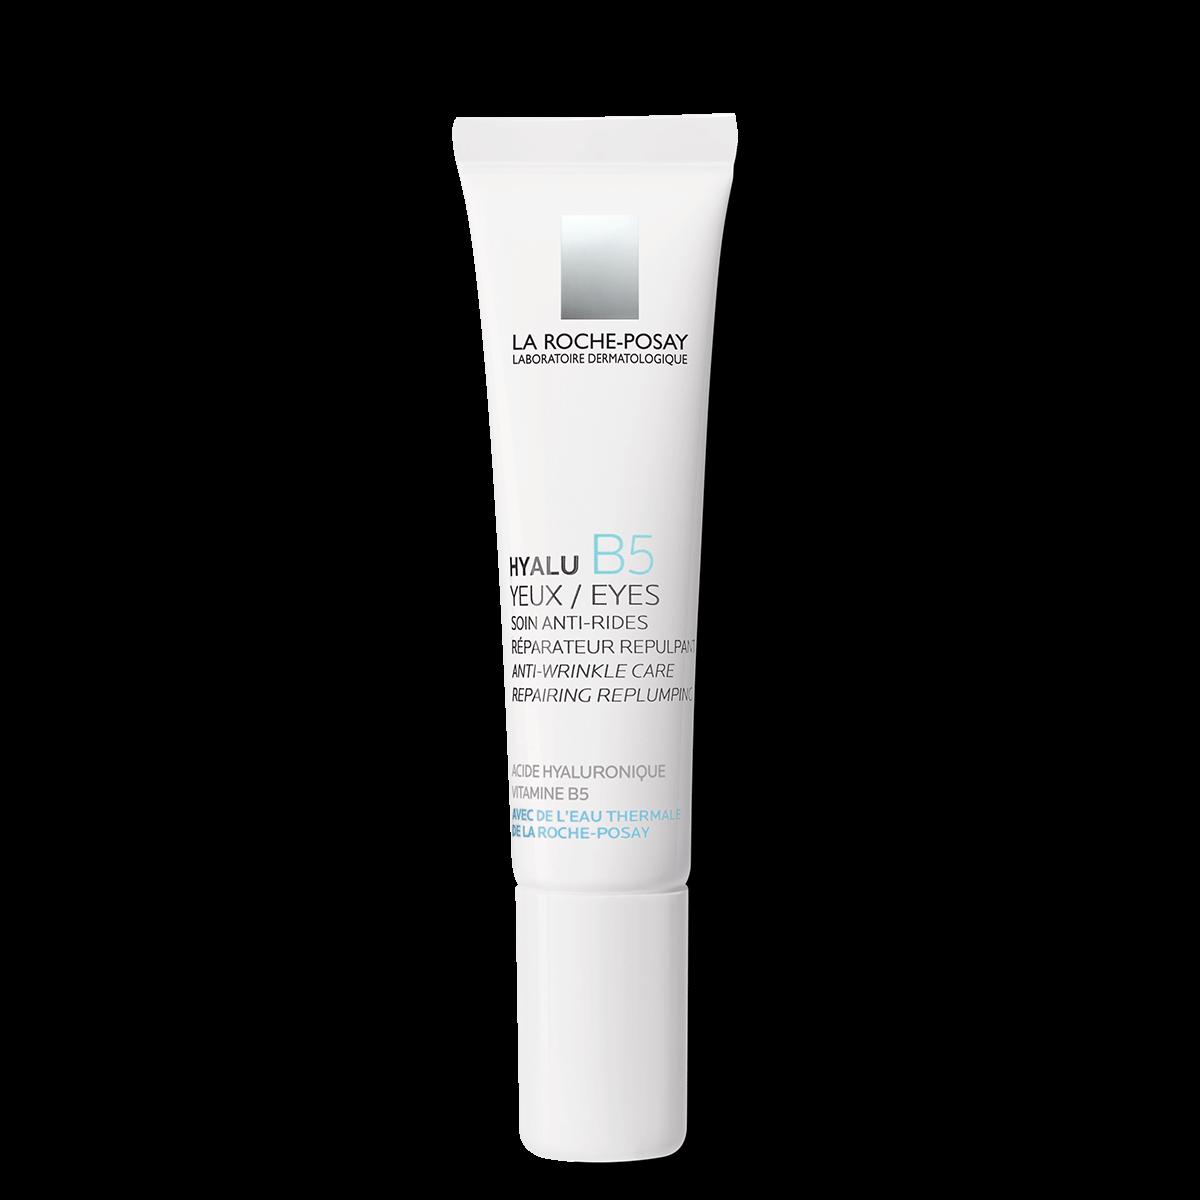 La Roche Posay ProductPage Anti Aging Hyalu B5 Eyes 40ml 3337875613668